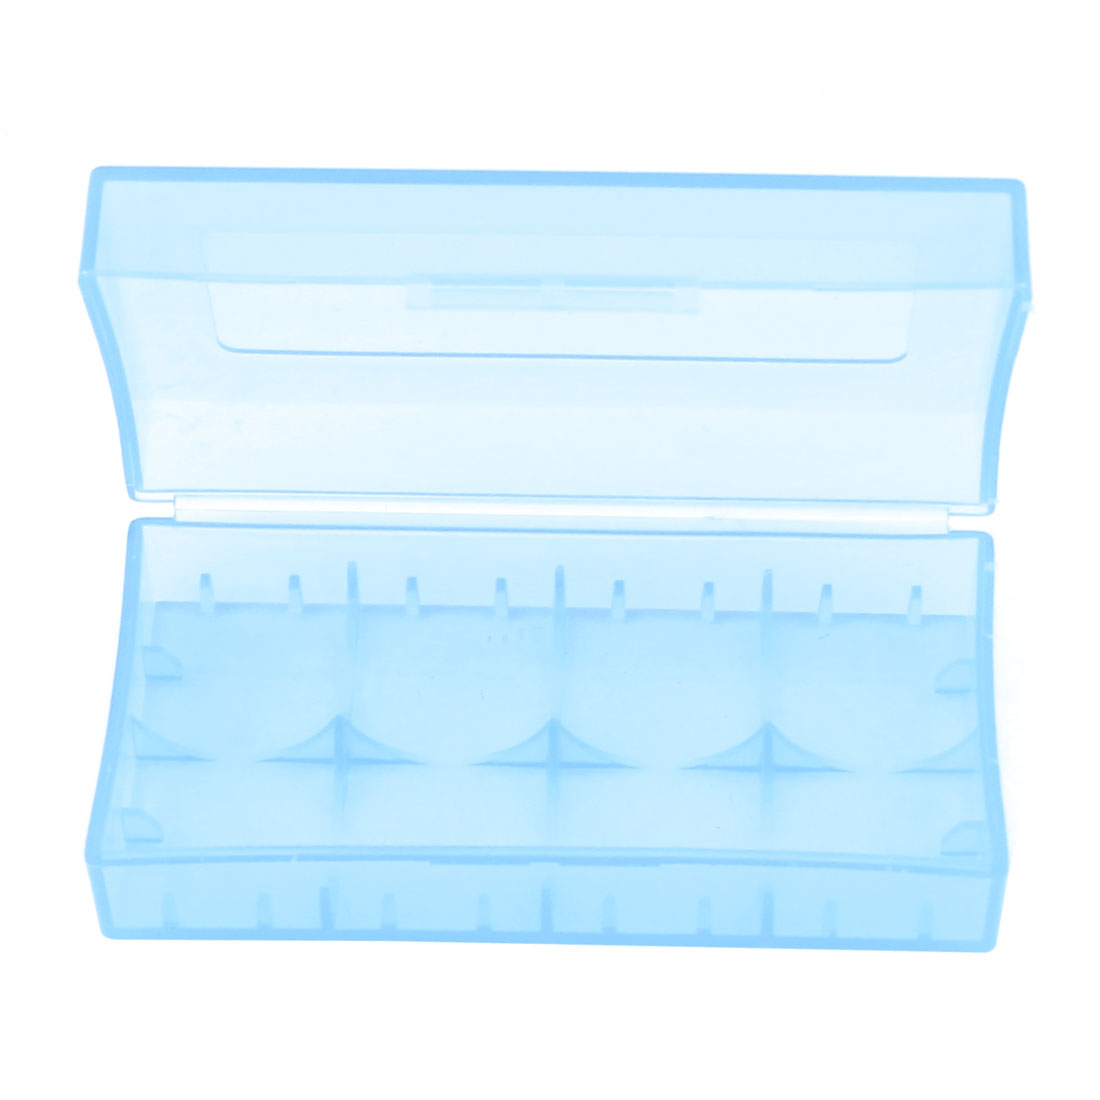 Hard Plastic Case Holder Storage Box Blue for 18650 16430 CR123A Battery